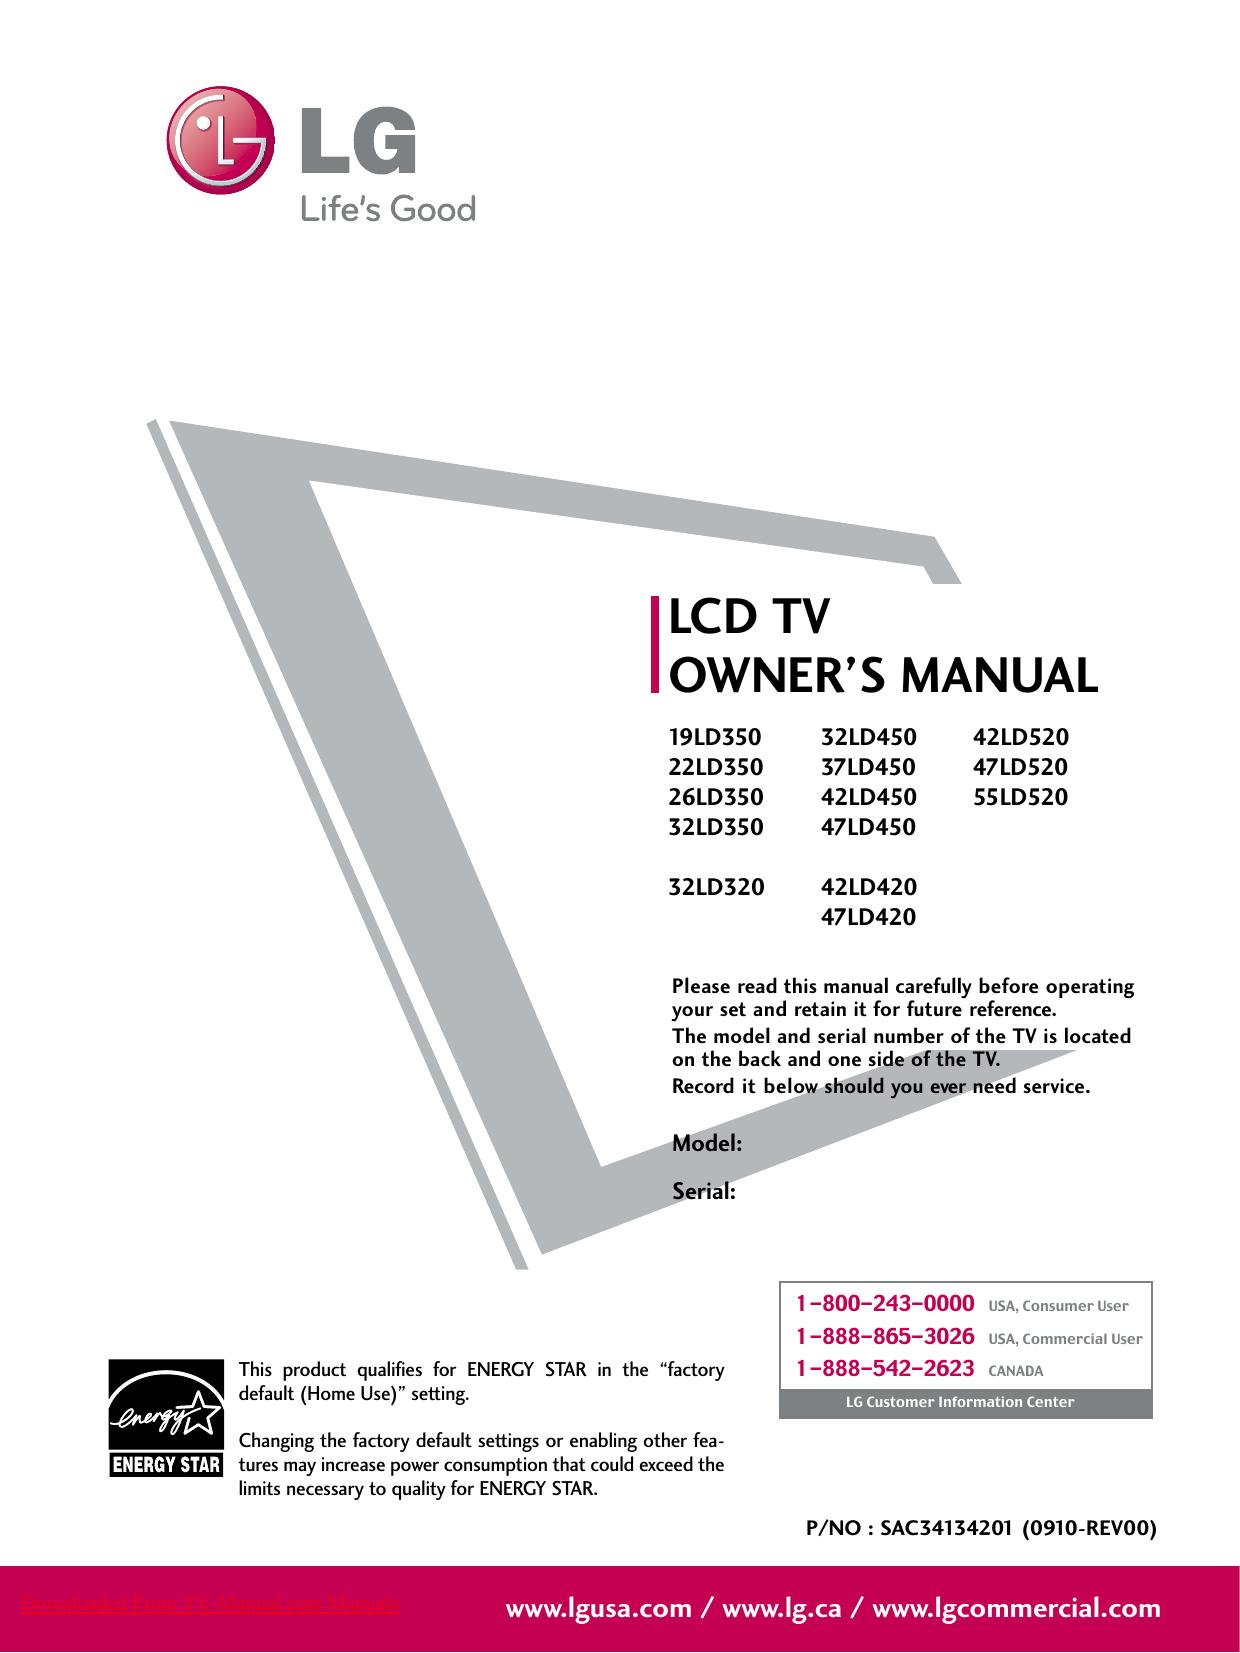 lg 32ld350 lcd tv user guide manualzz com rh manualzz com lg 32ld350 manuel lg 32ld350 service manual